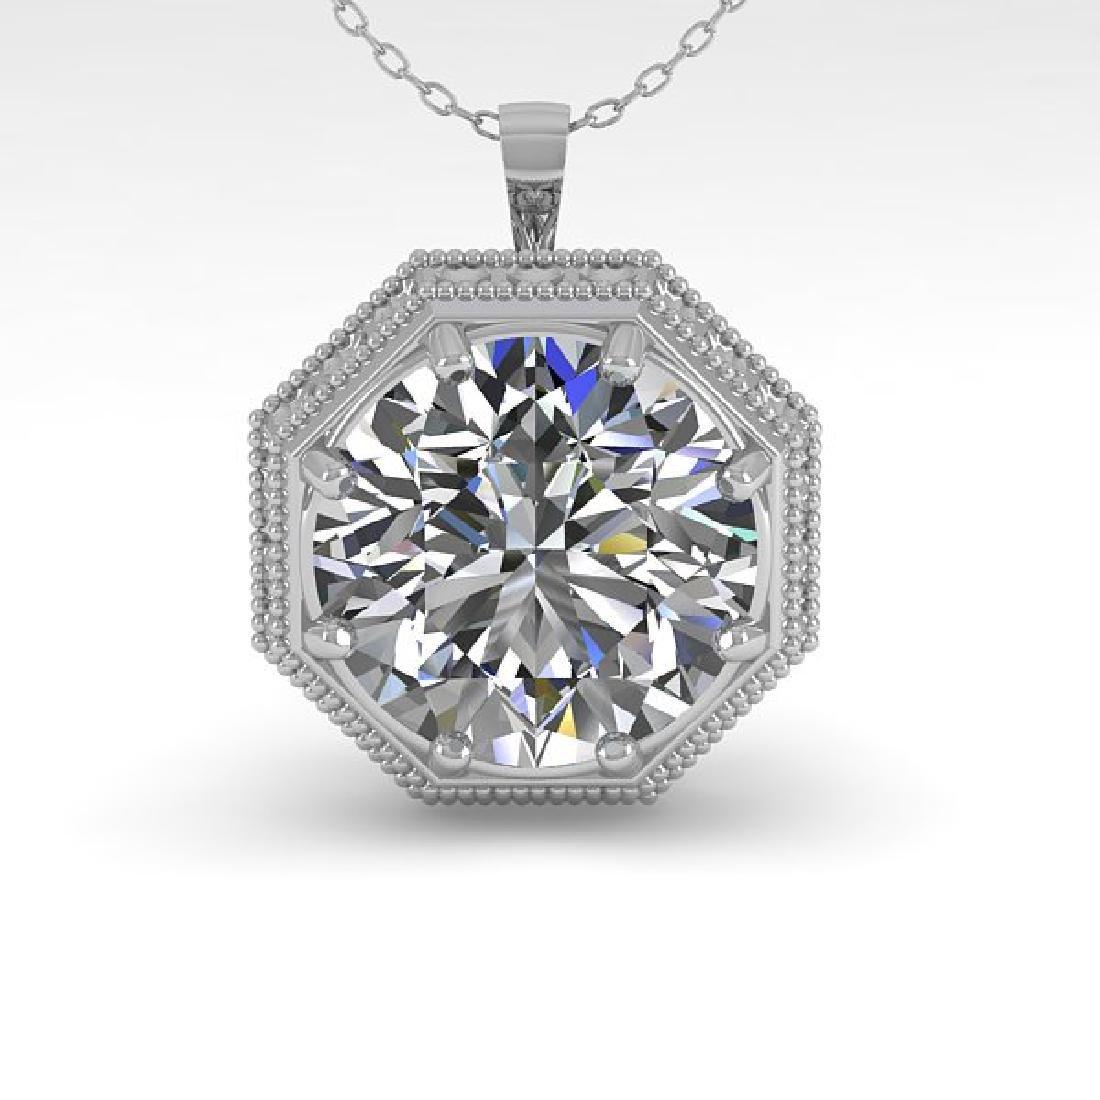 1.50 CTW VS/SI Diamond Solitaire Necklace 14K White - 2